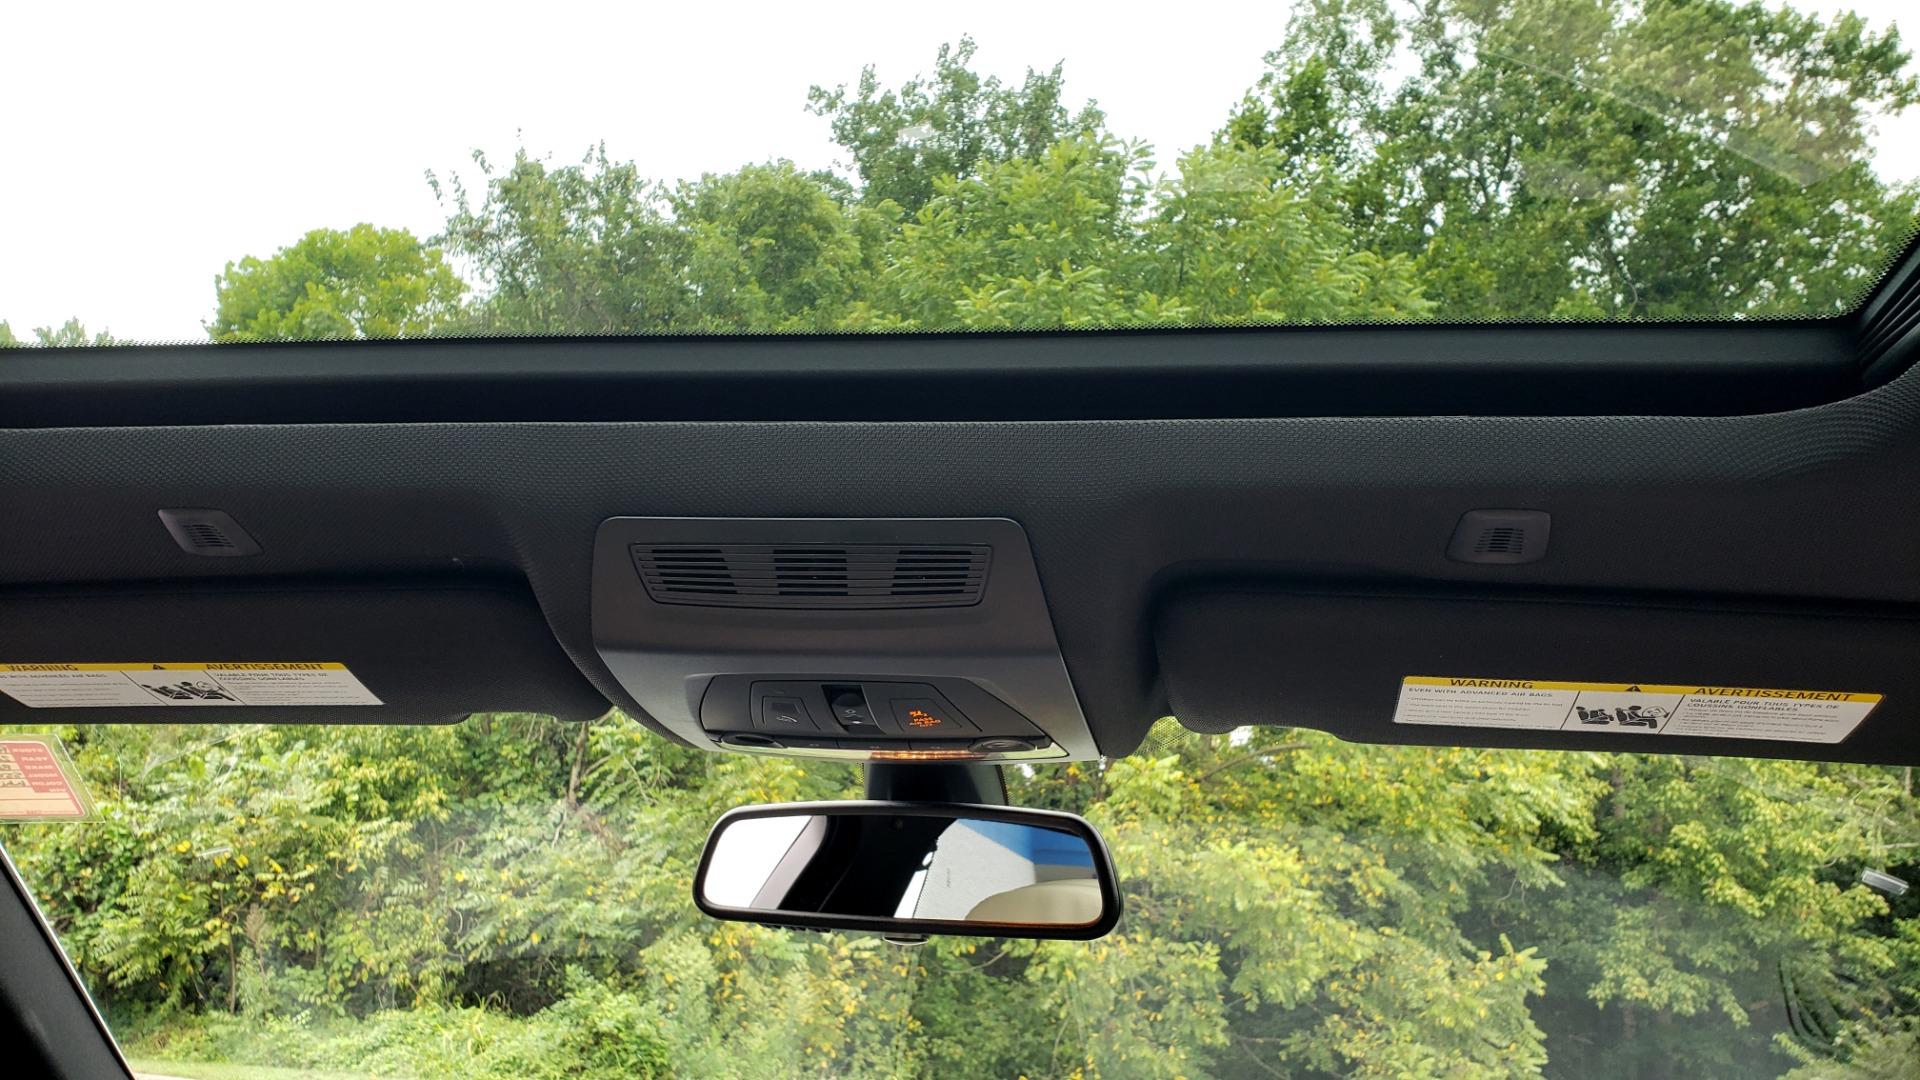 Used 2012 BMW 5 SERIES 550I M SPORT / NAV / CONV PKG / SUNROOF / PREM SND / REARVIEW for sale Sold at Formula Imports in Charlotte NC 28227 66